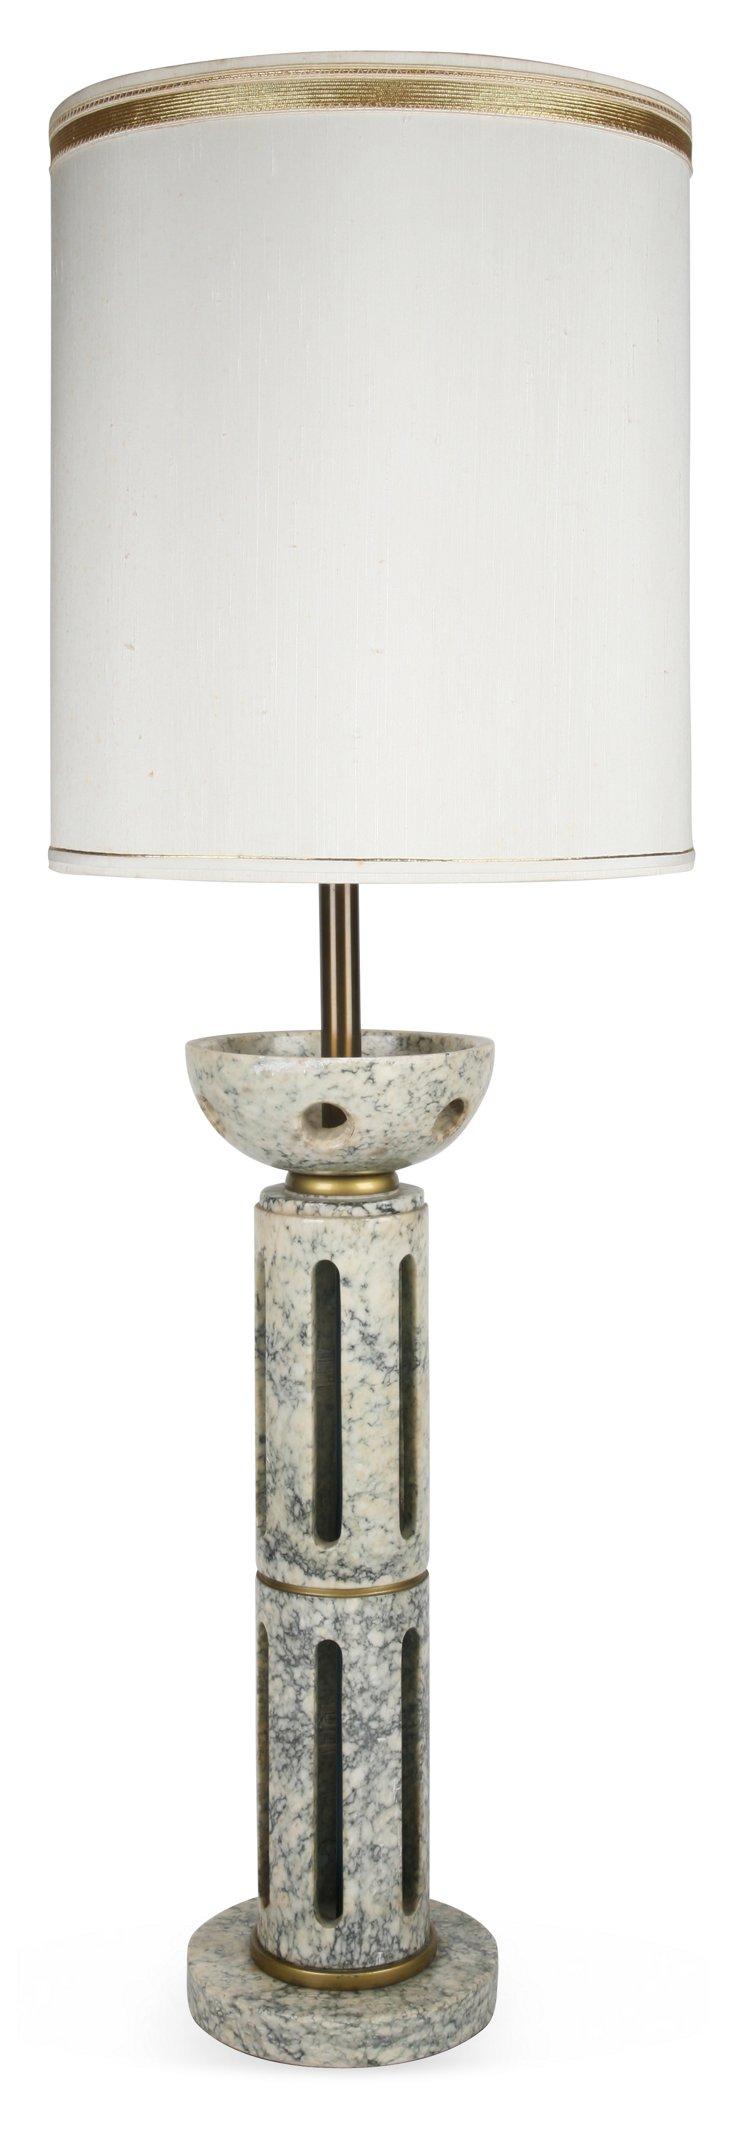 Italian Marble Lamp w/ Shade